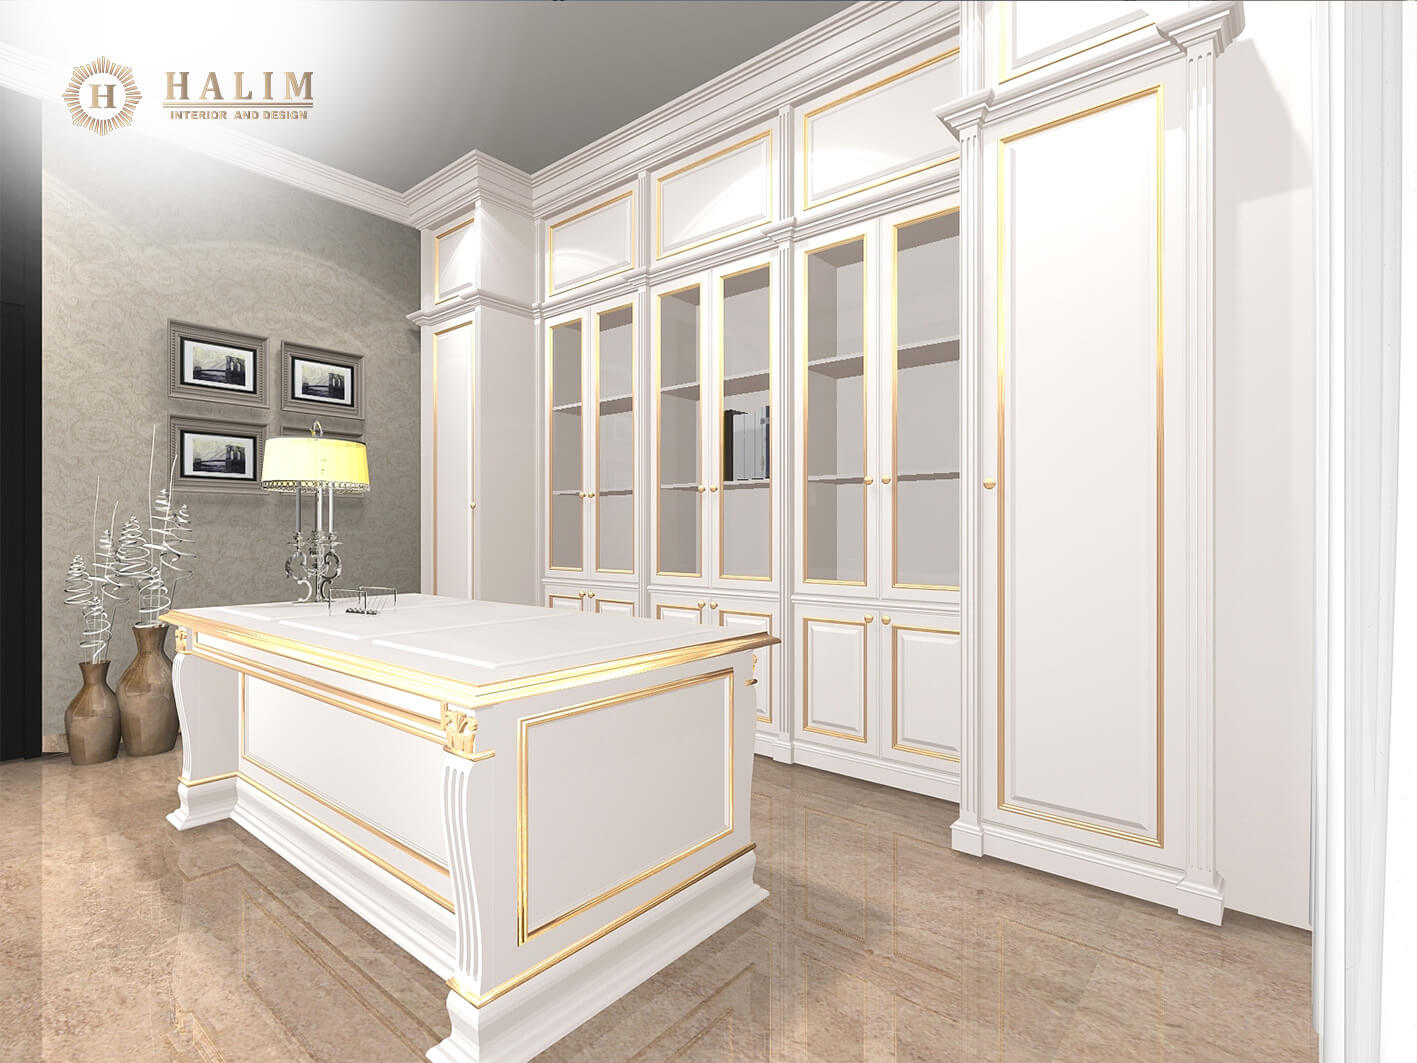 Halim-Interior-modern-furniture-contemporer-american-style-minimalist-european-classic-surabaya (5)